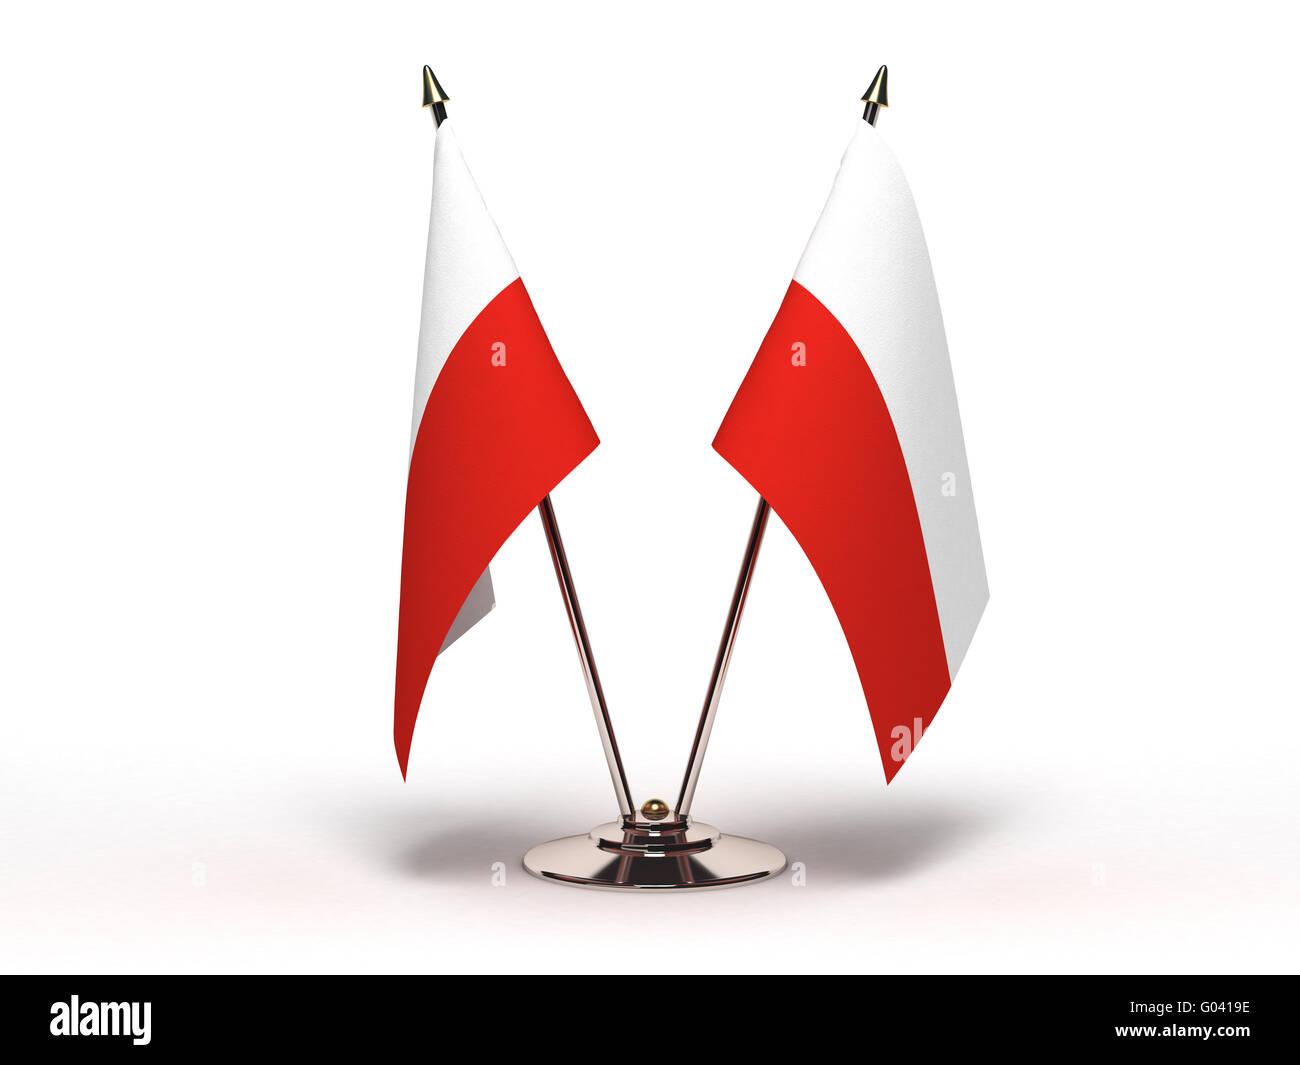 Miniature Flag of Poland - Stock Image